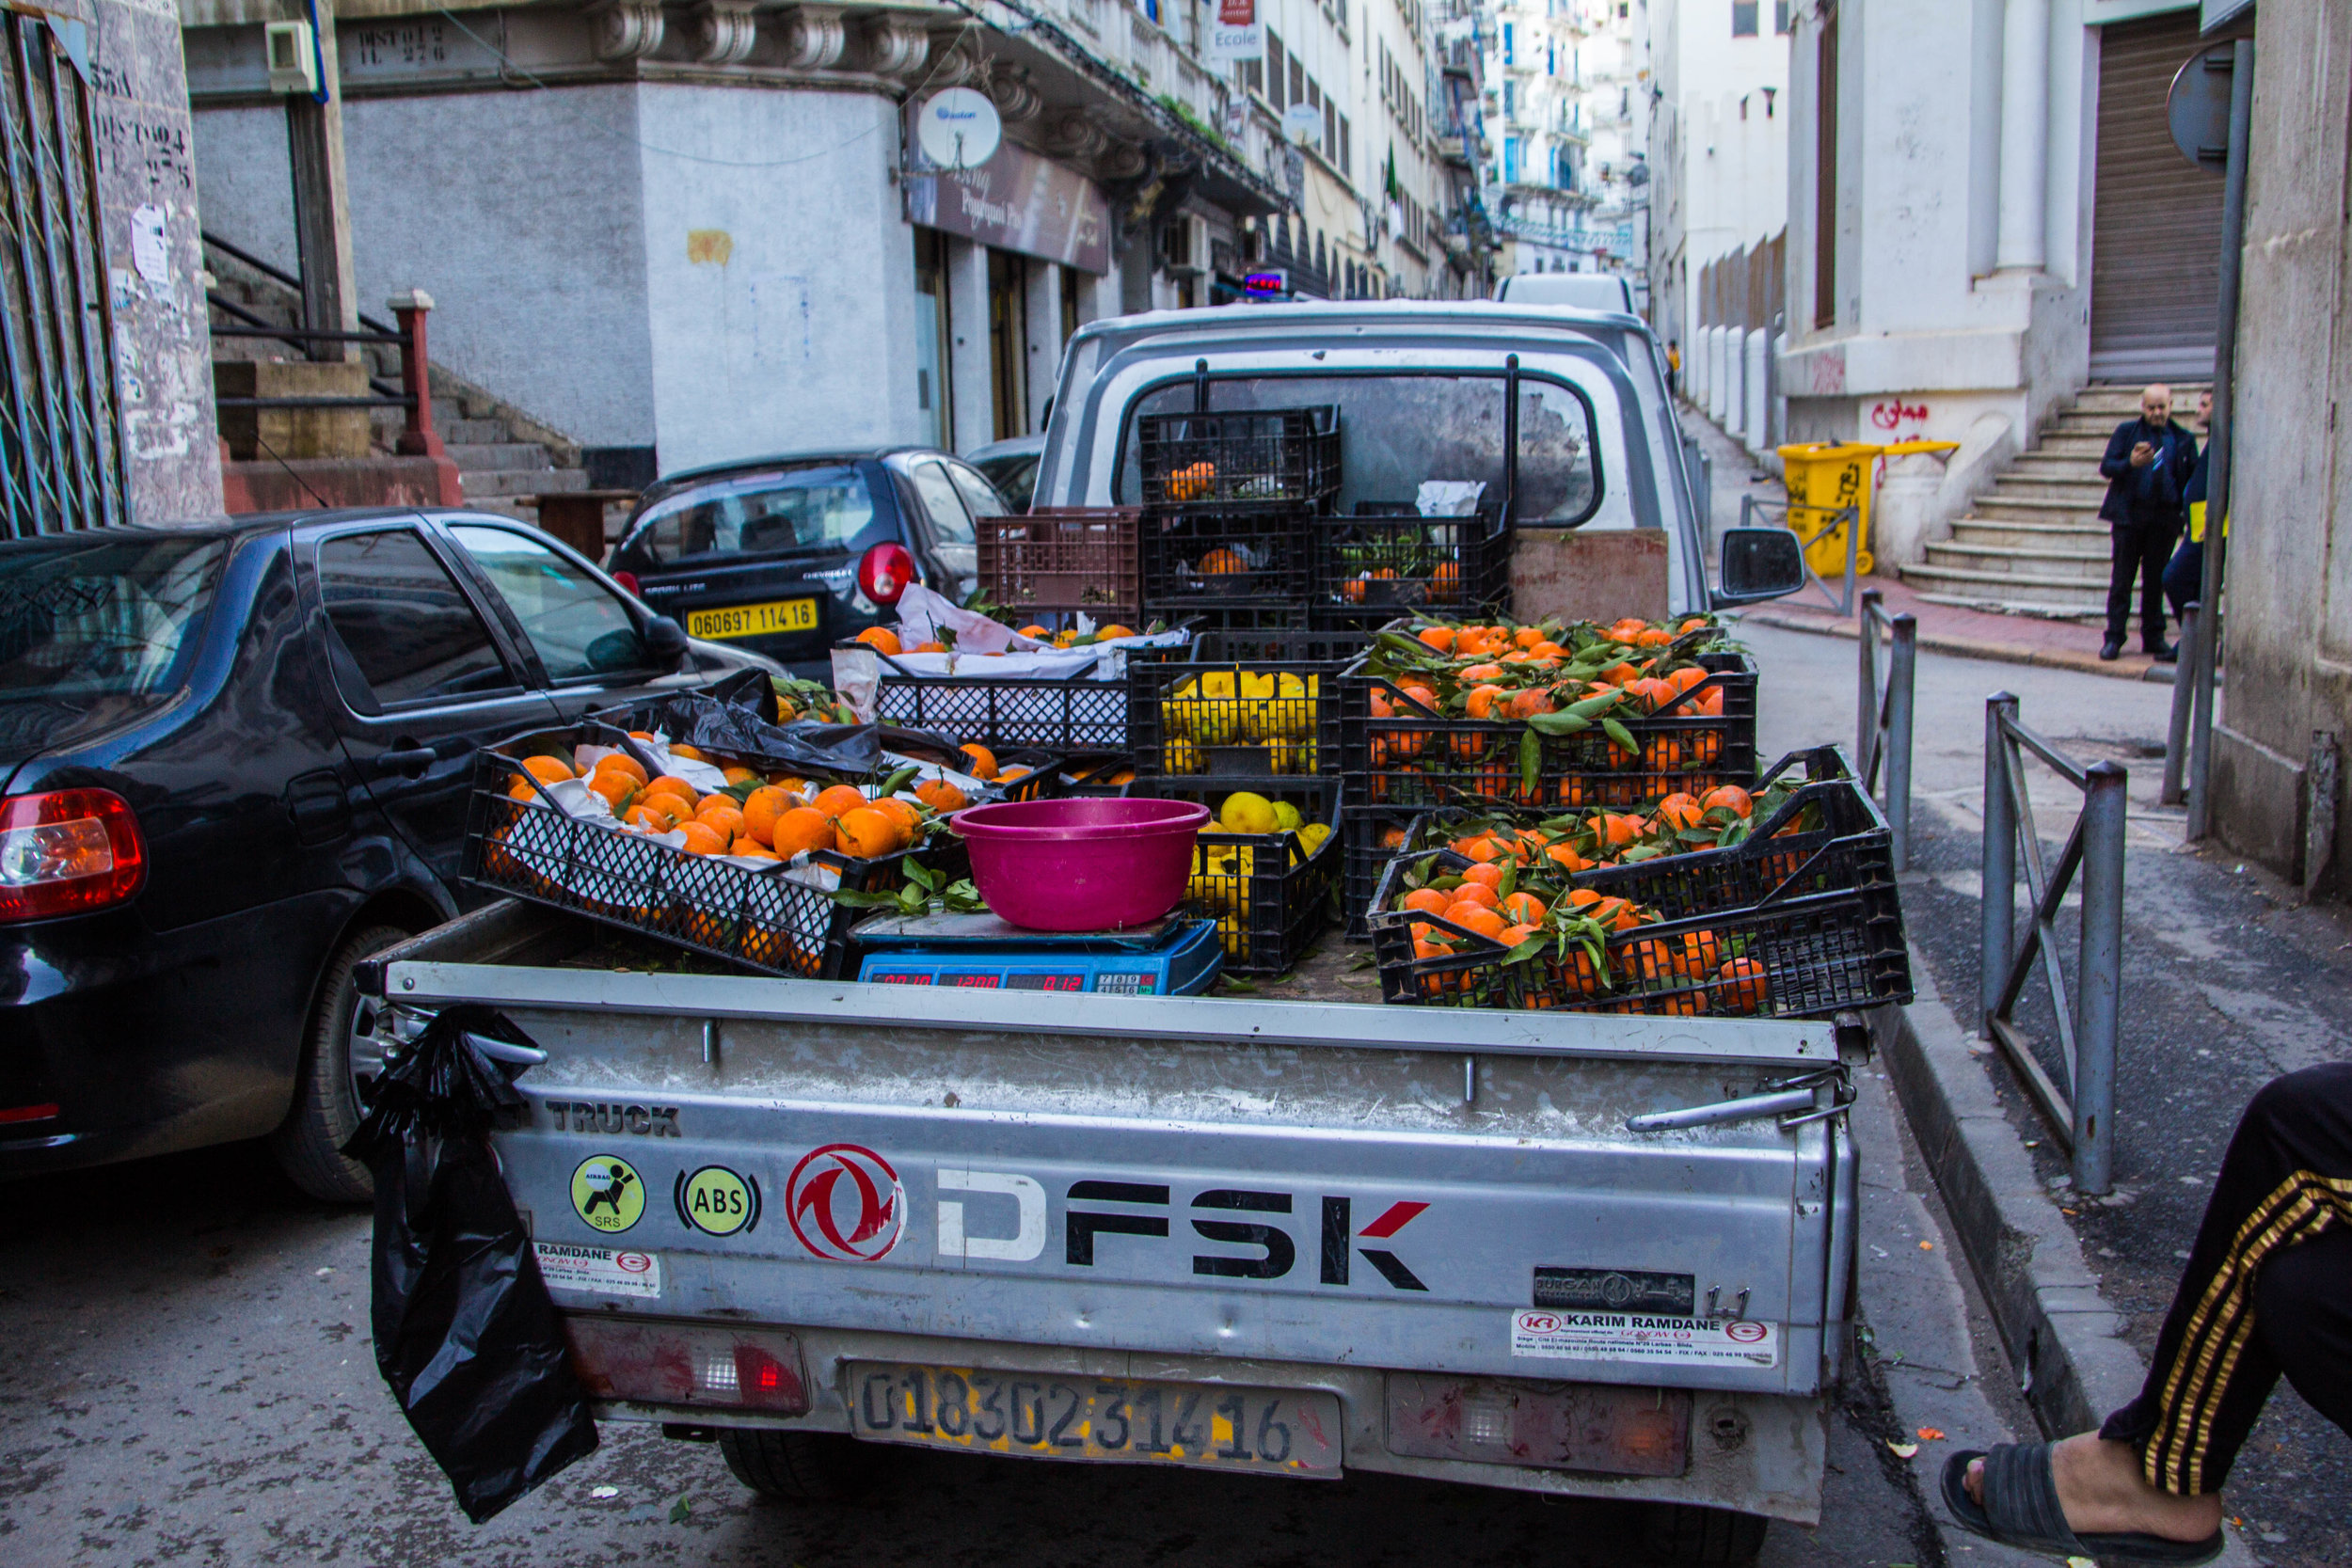 streets-algiers-algeria-23-2.jpg